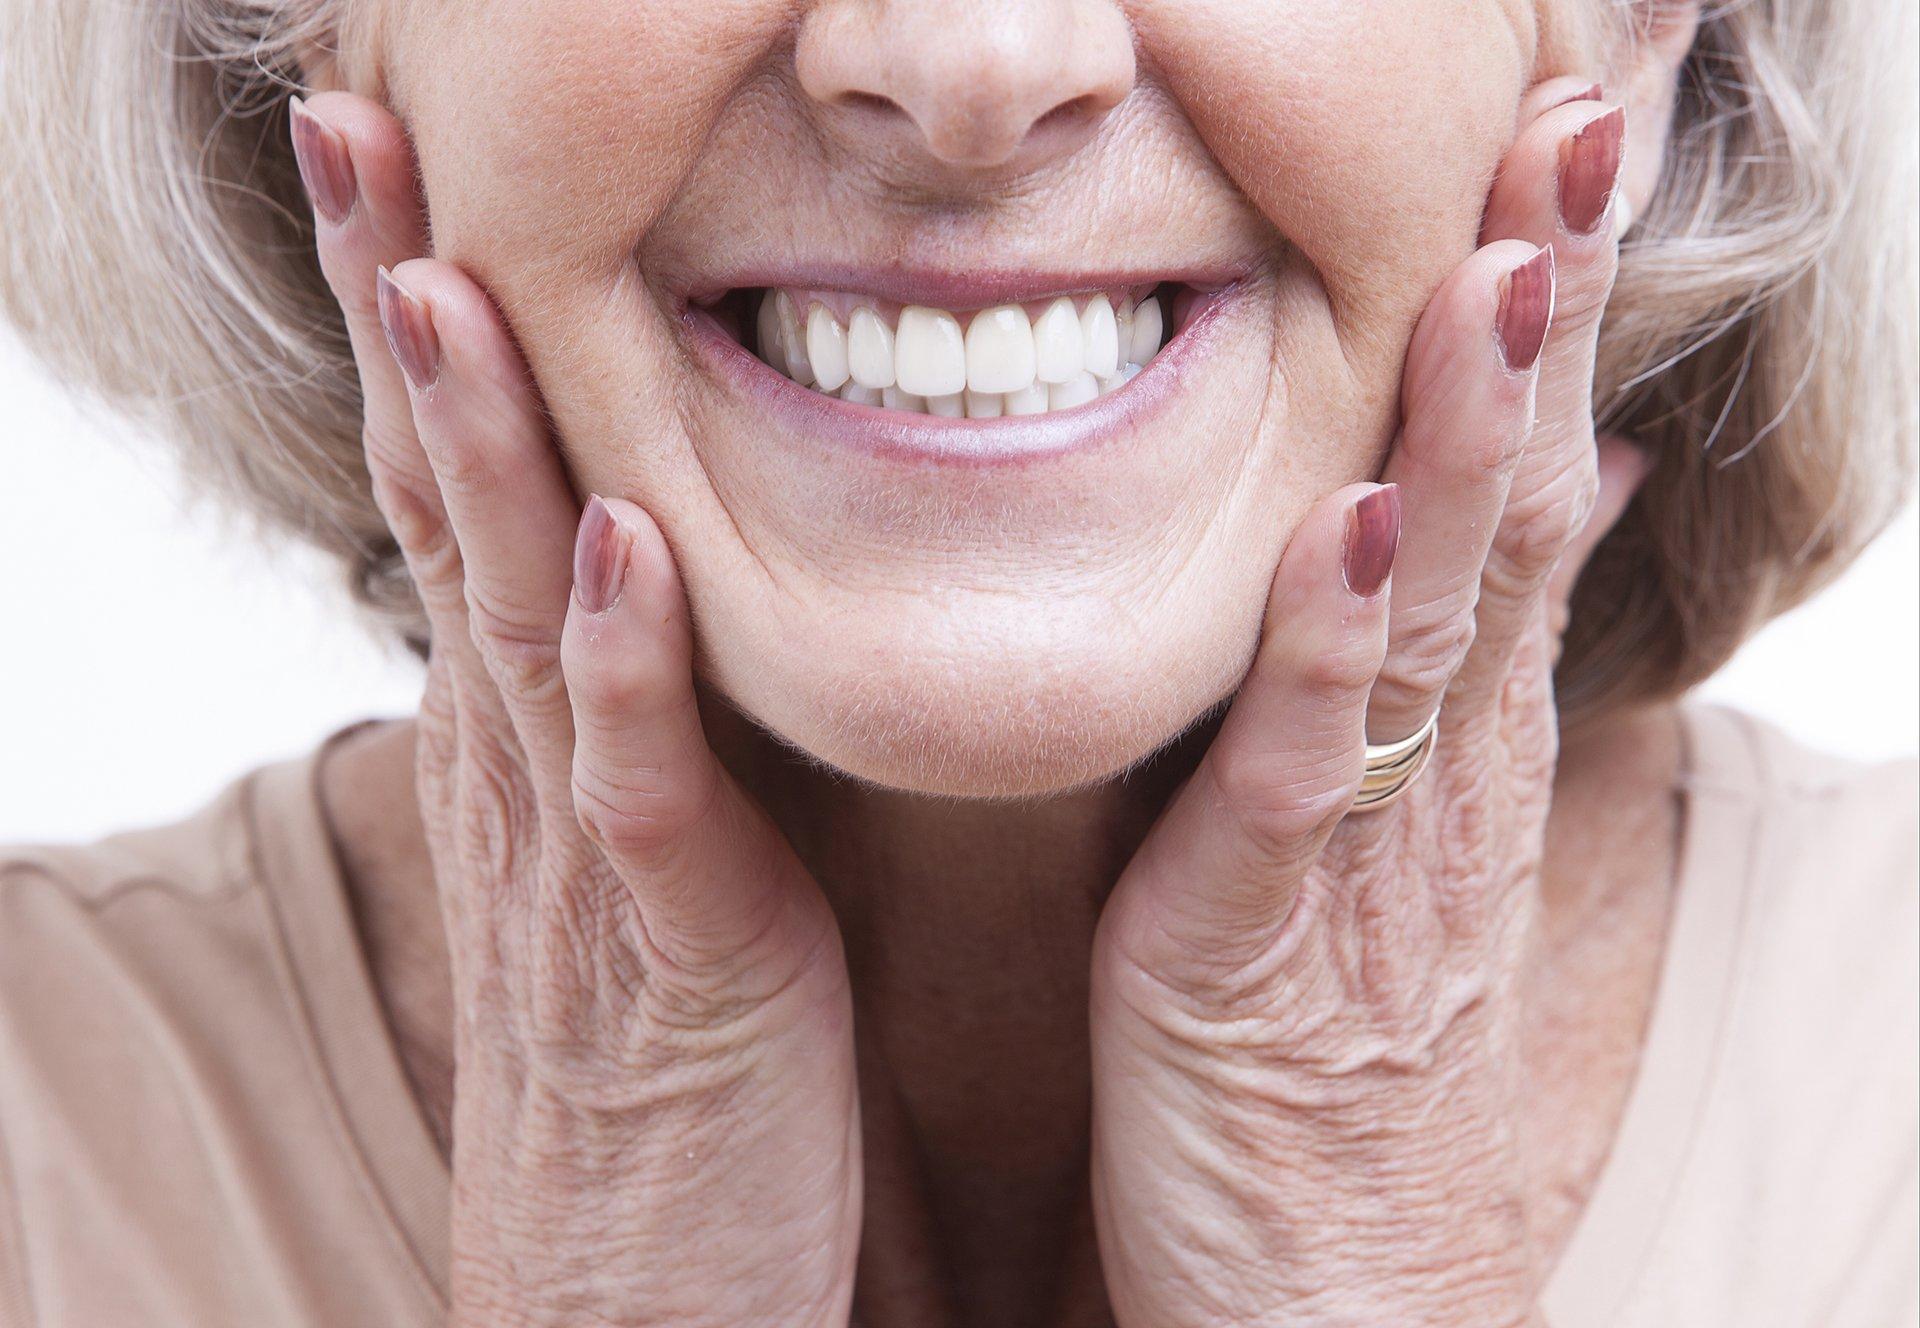 Dentures in the 21st Century